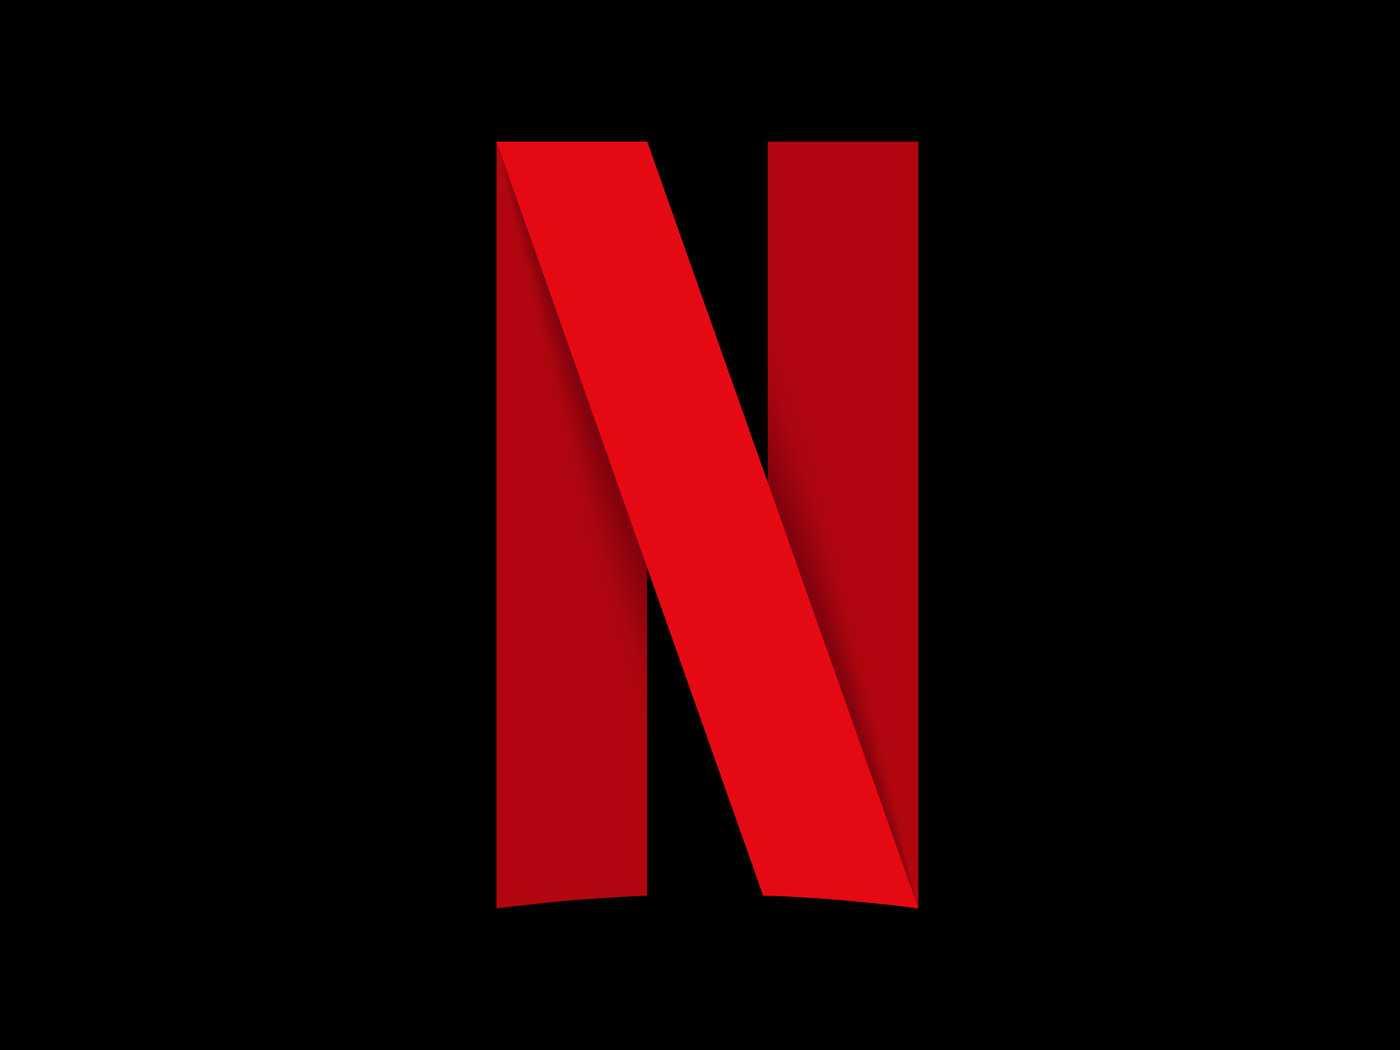 Netflixsverige Profile Picture